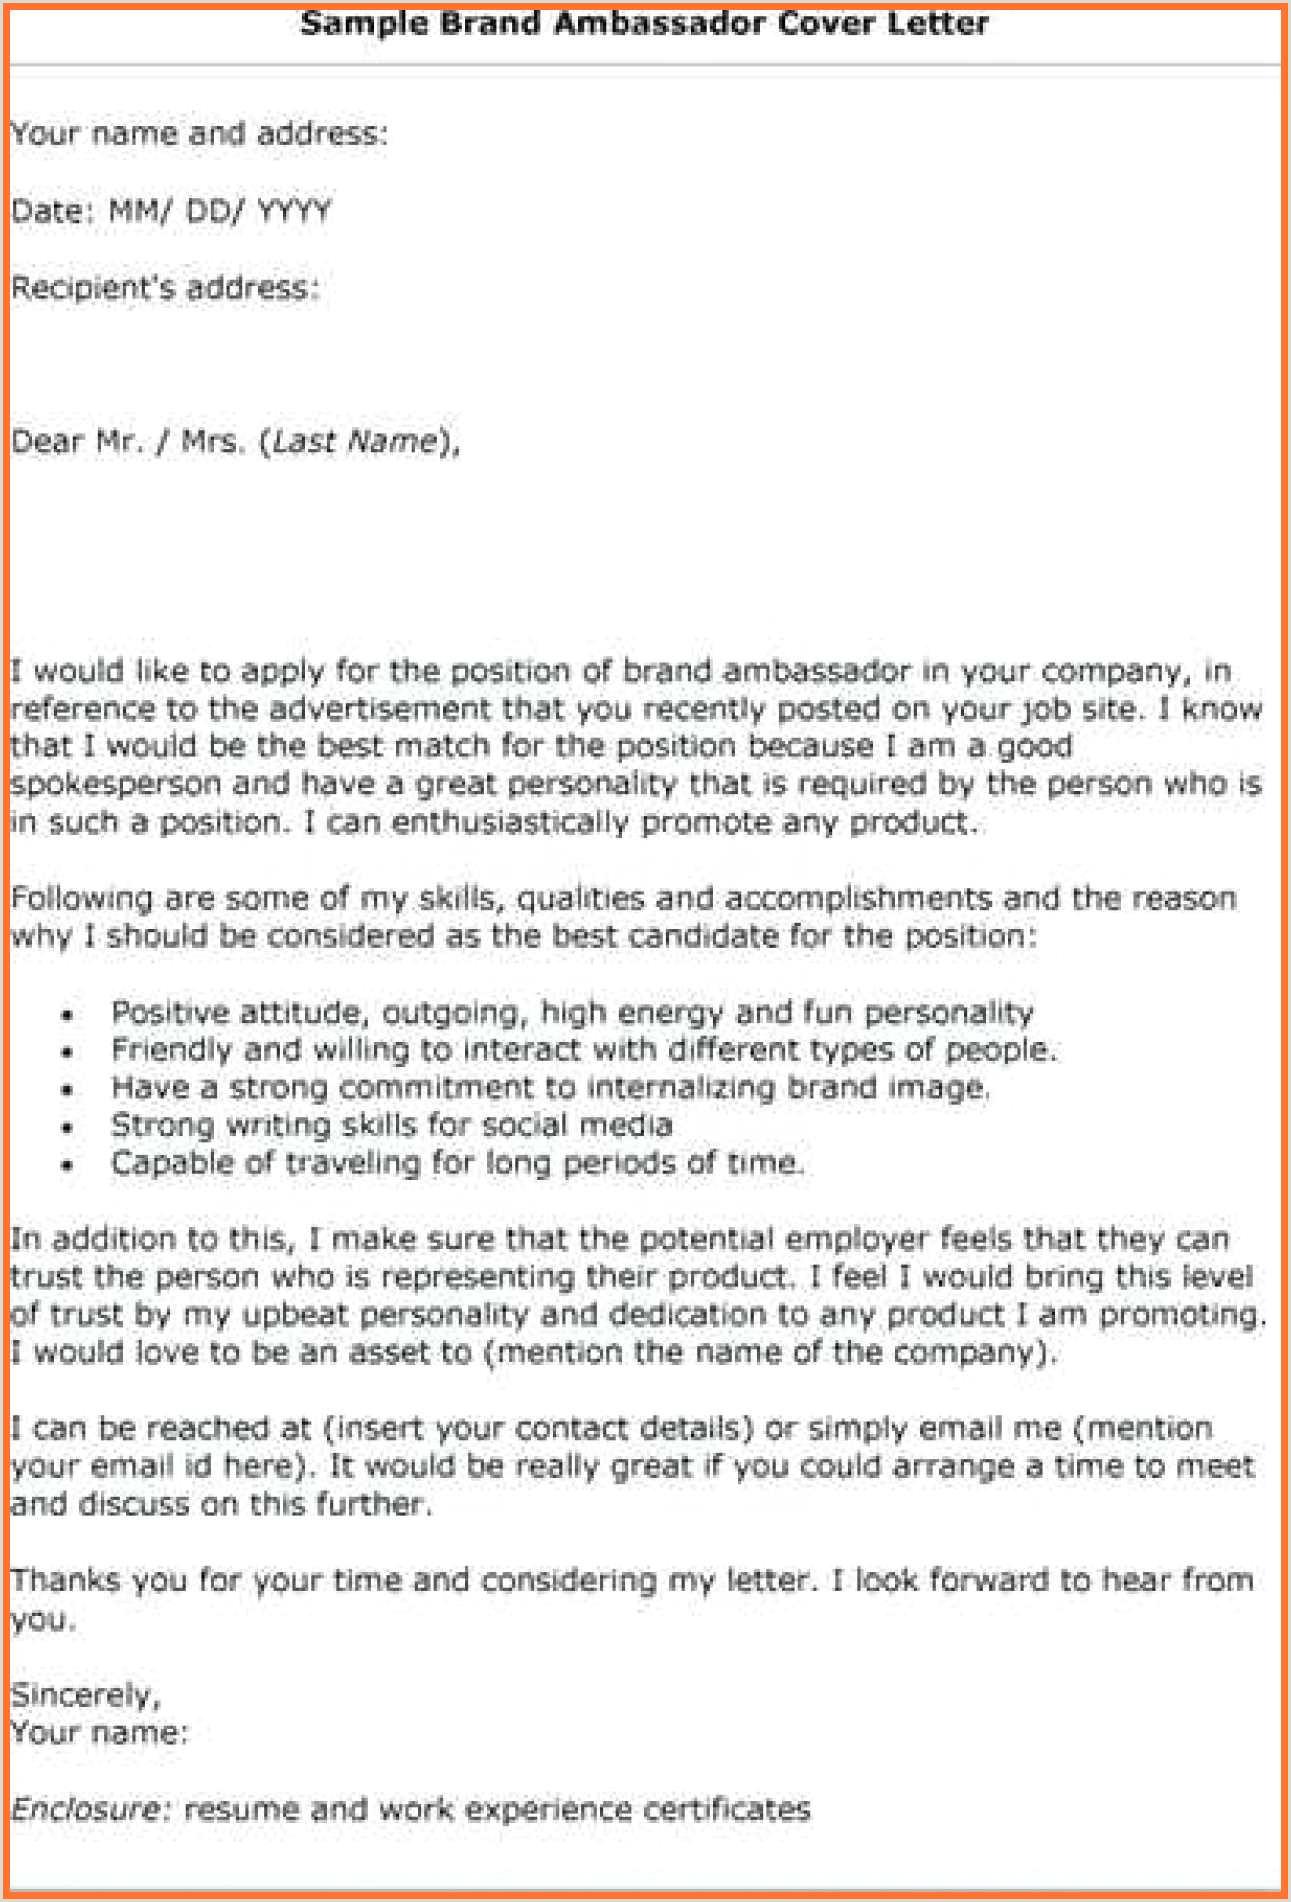 9 10 student ambassador cover letter